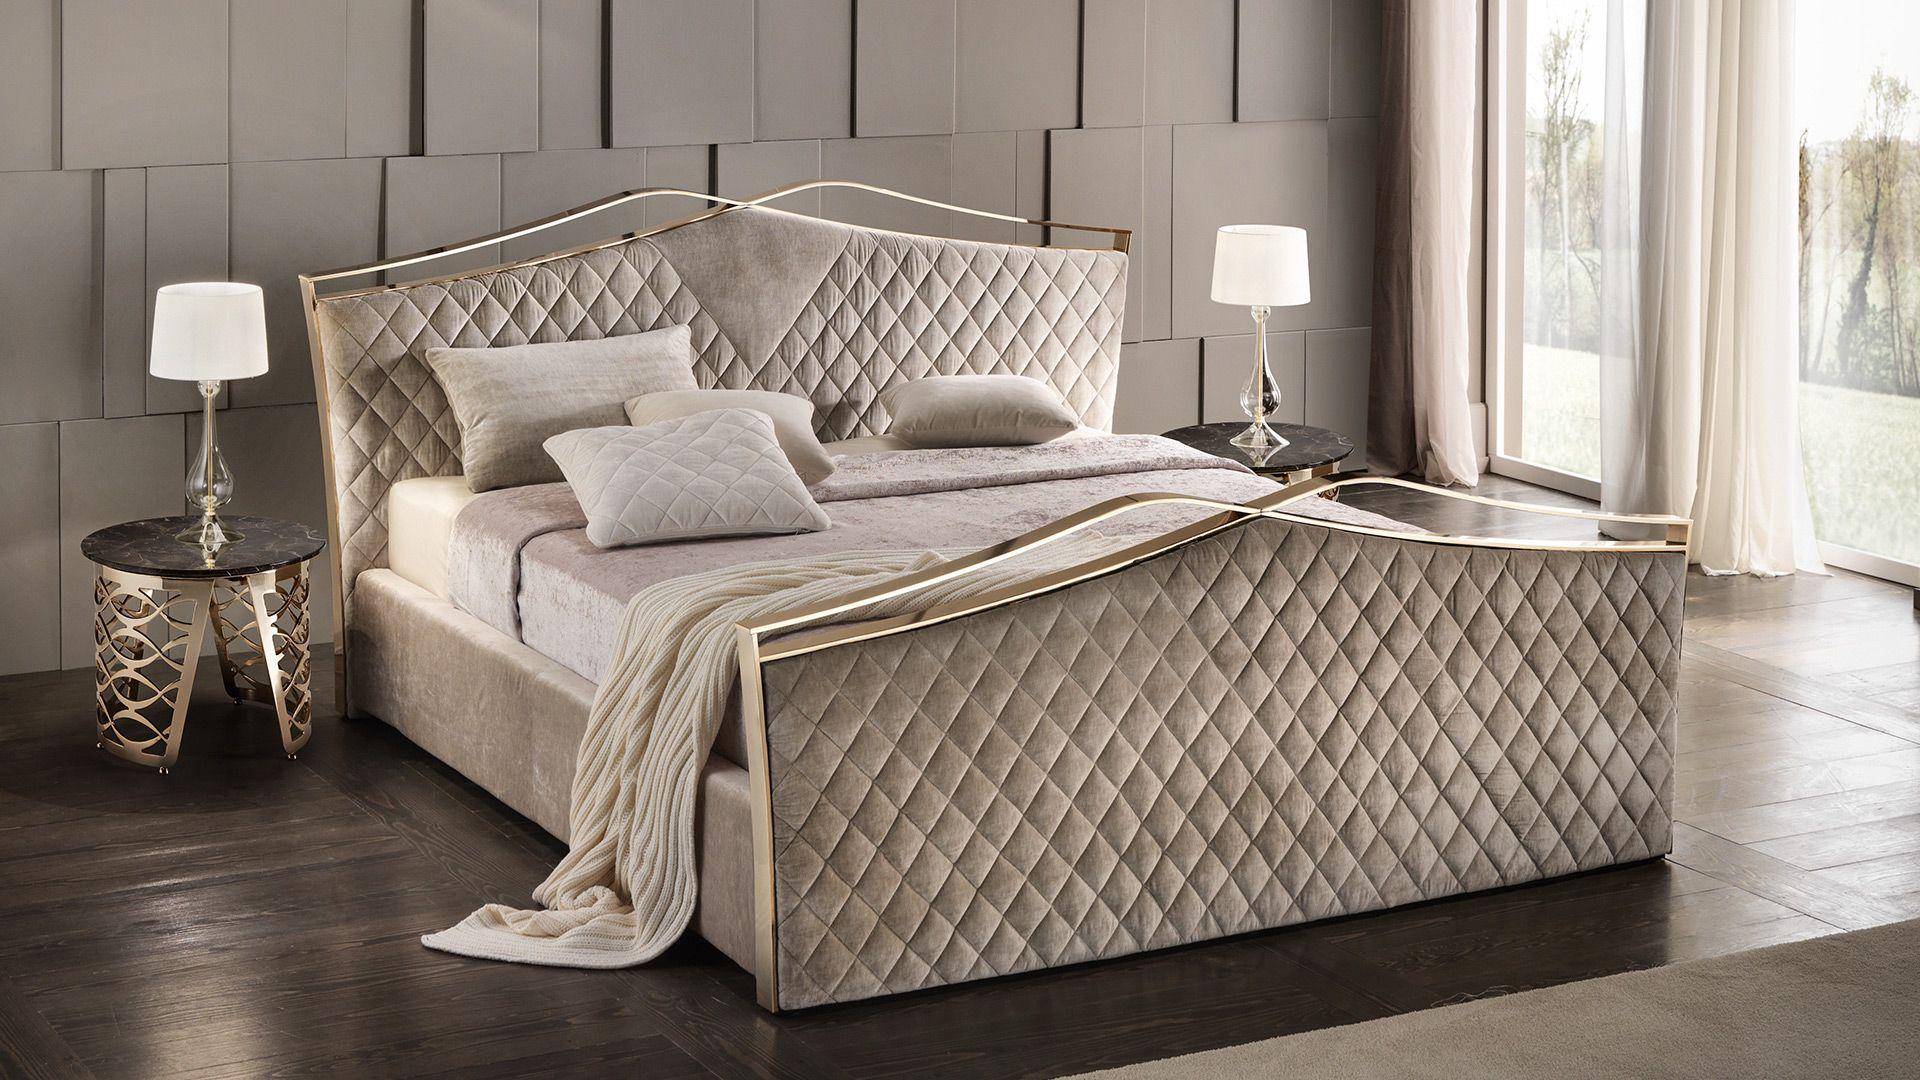 Master bedroom bed  Pin by Yavuz Kurt on moble tasarim  Pinterest  Bedrooms Bed room